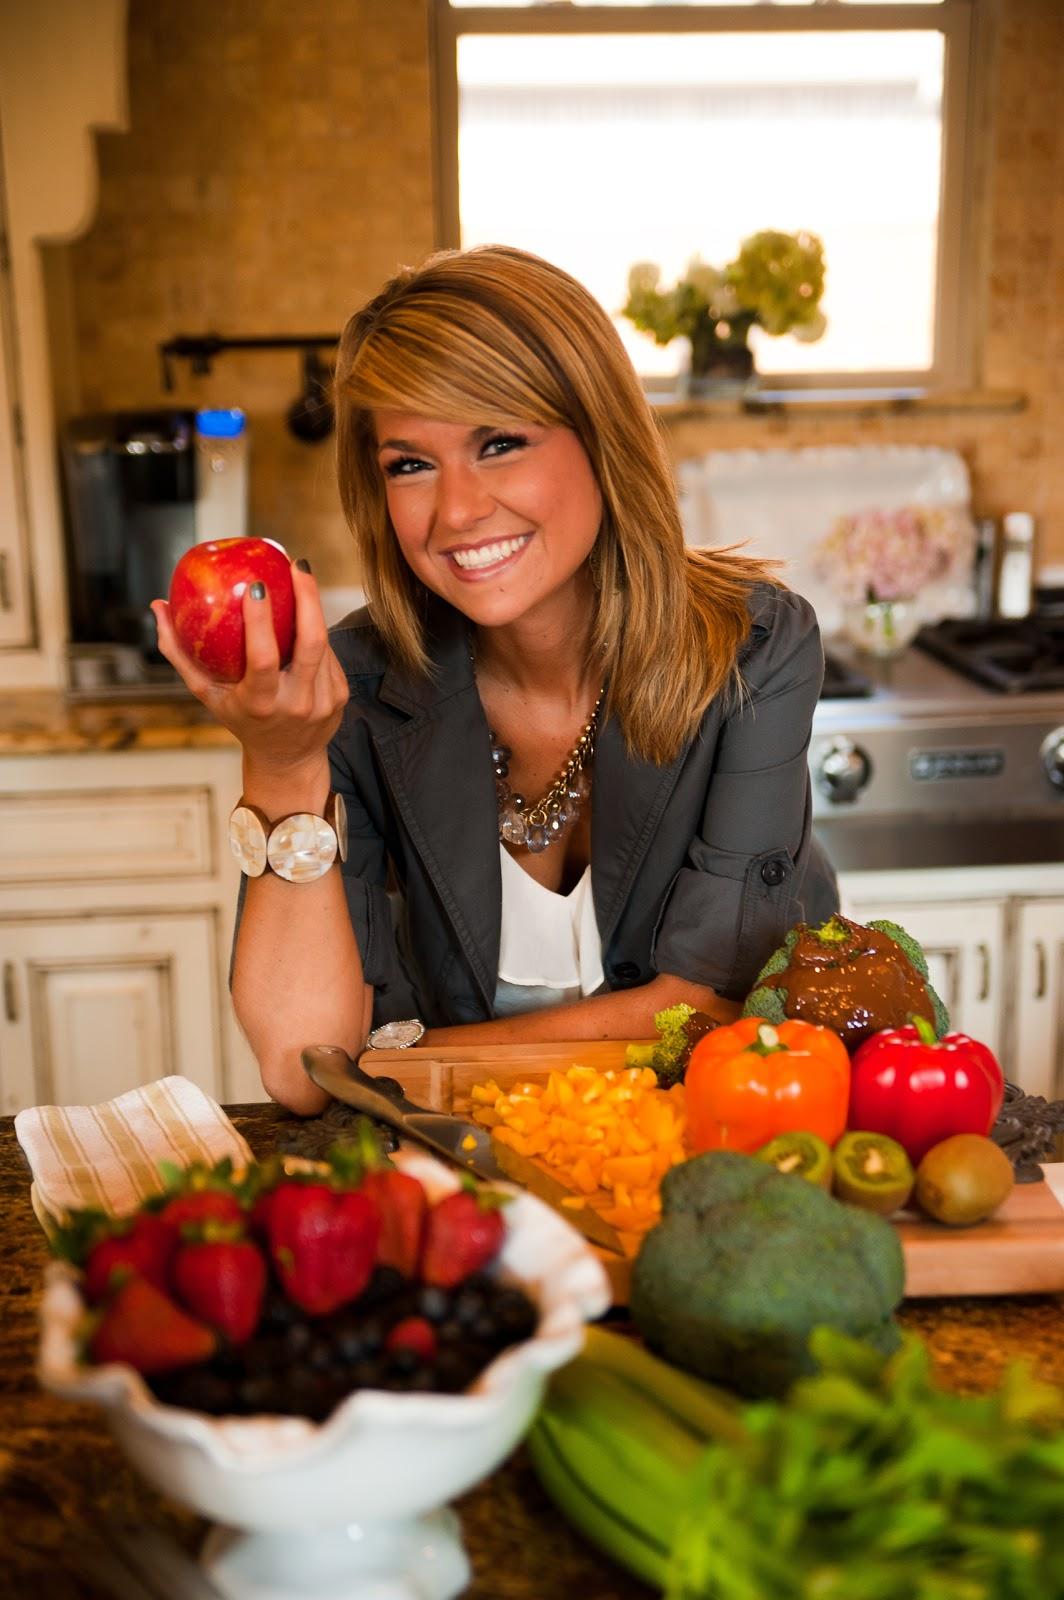 Hcg diet plan vegetables